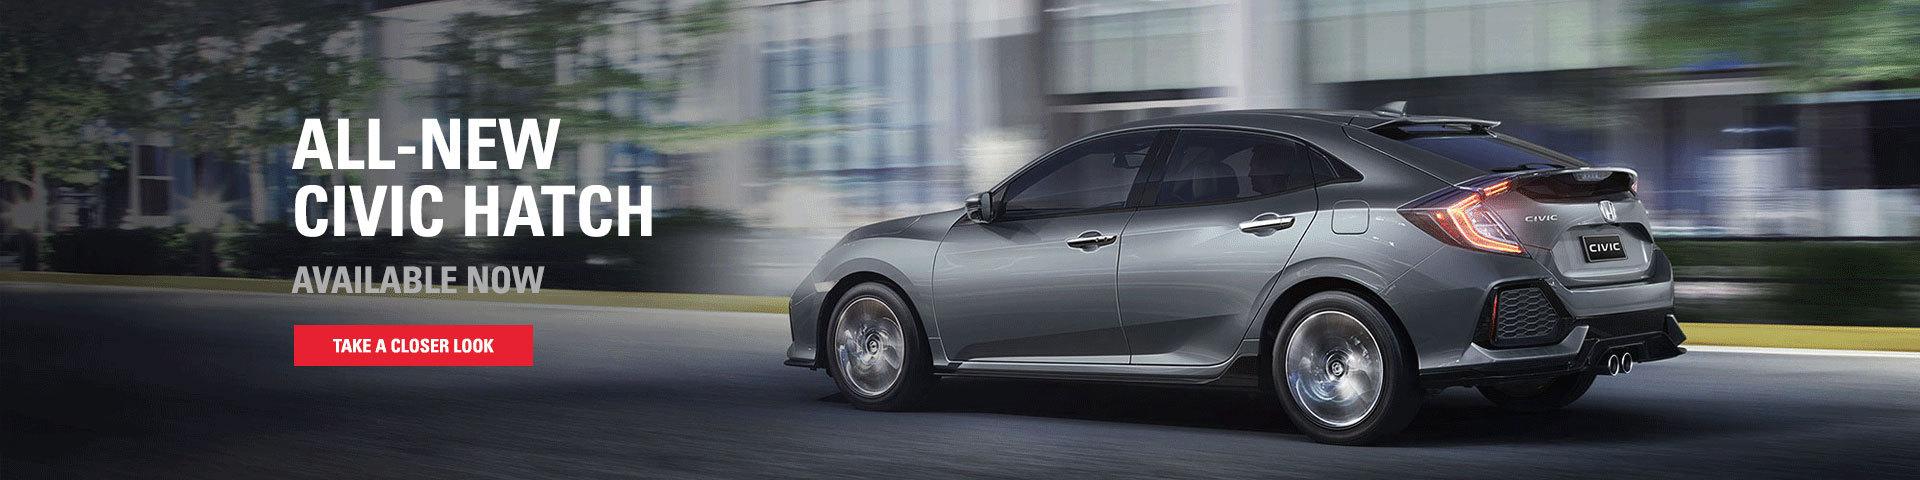 All New Honda Civic Hatch